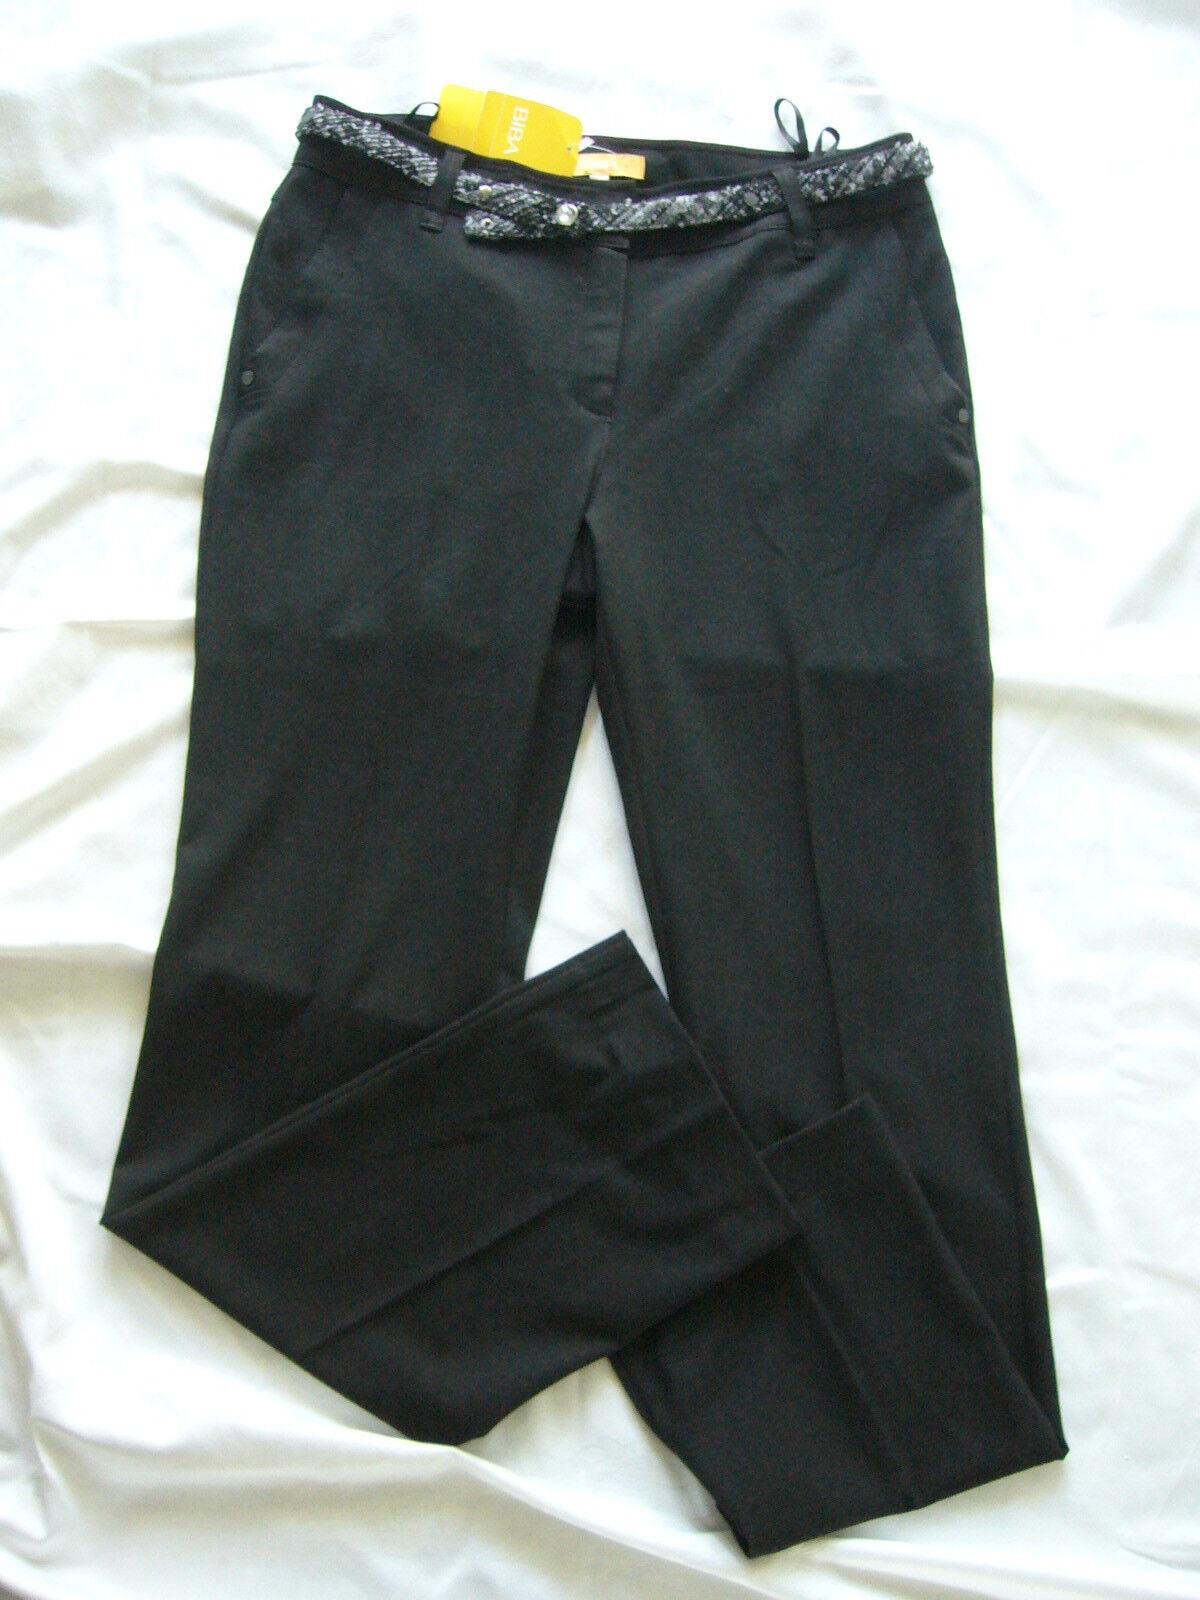 Biba Pantaloni fashion night Anthra con cintura tg. 38 -- con NUOVO 941cde ee8b82ee888d